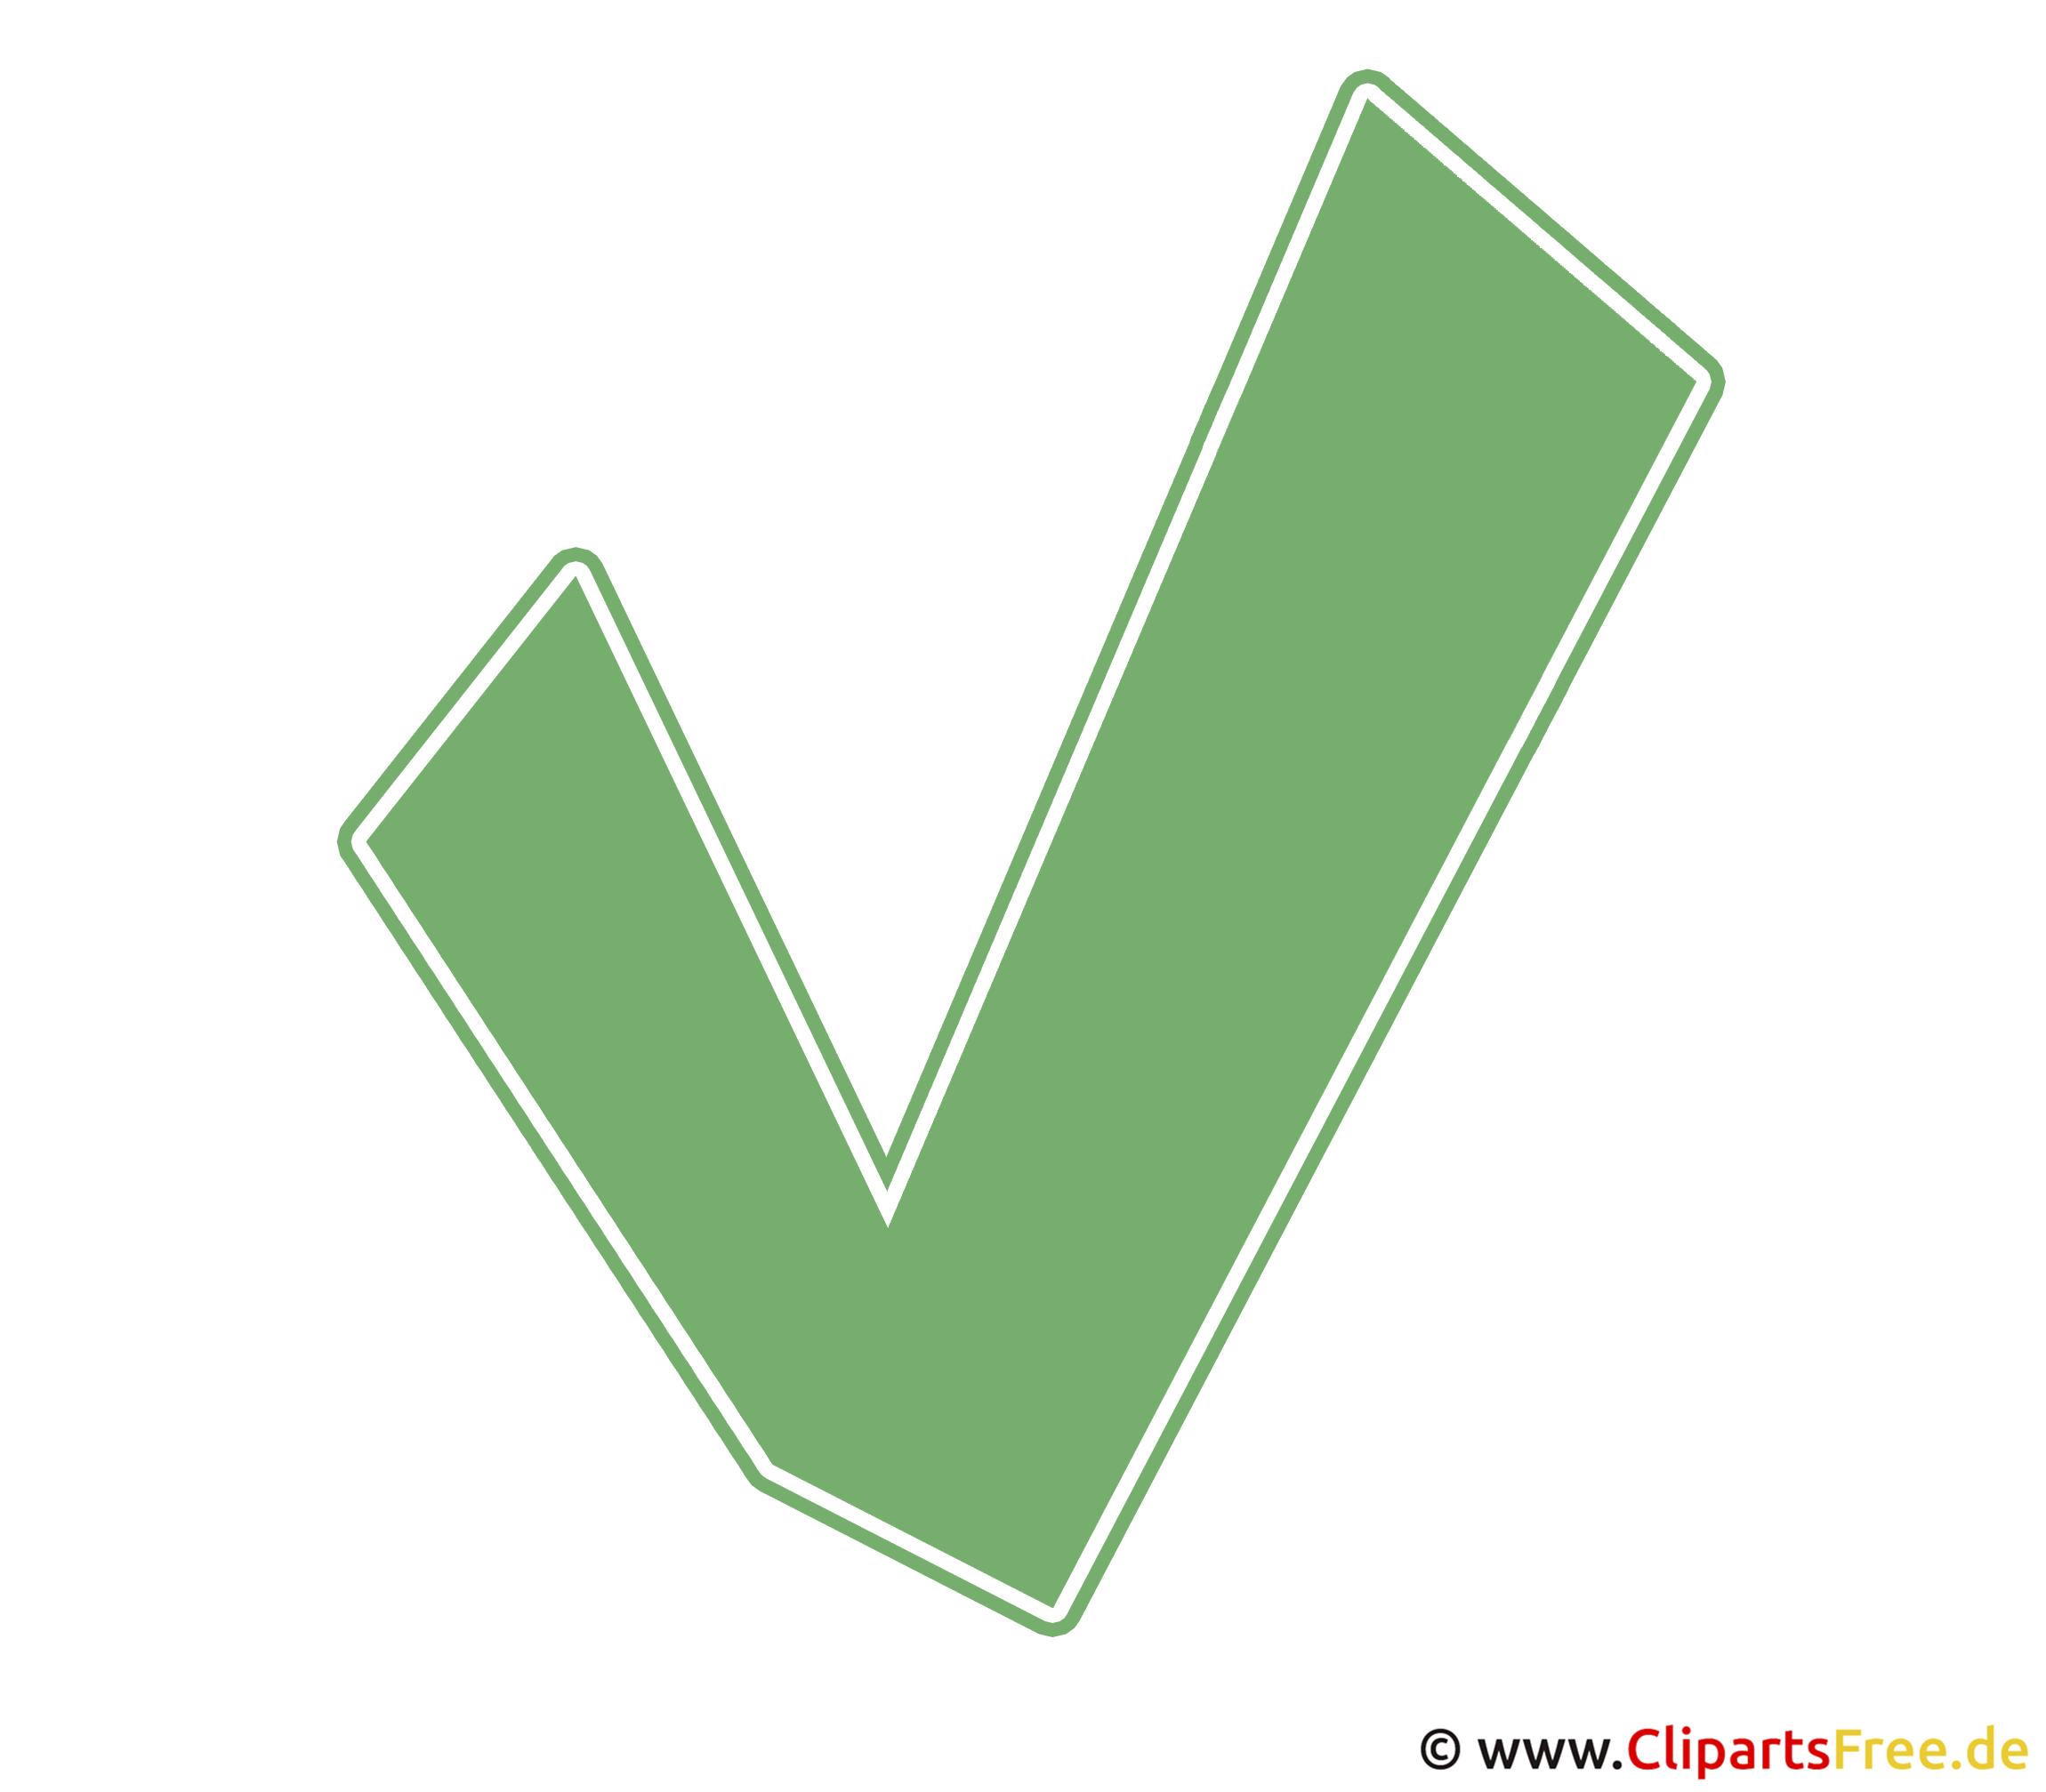 Haken symbol png grüner Transparenter Hintergrund